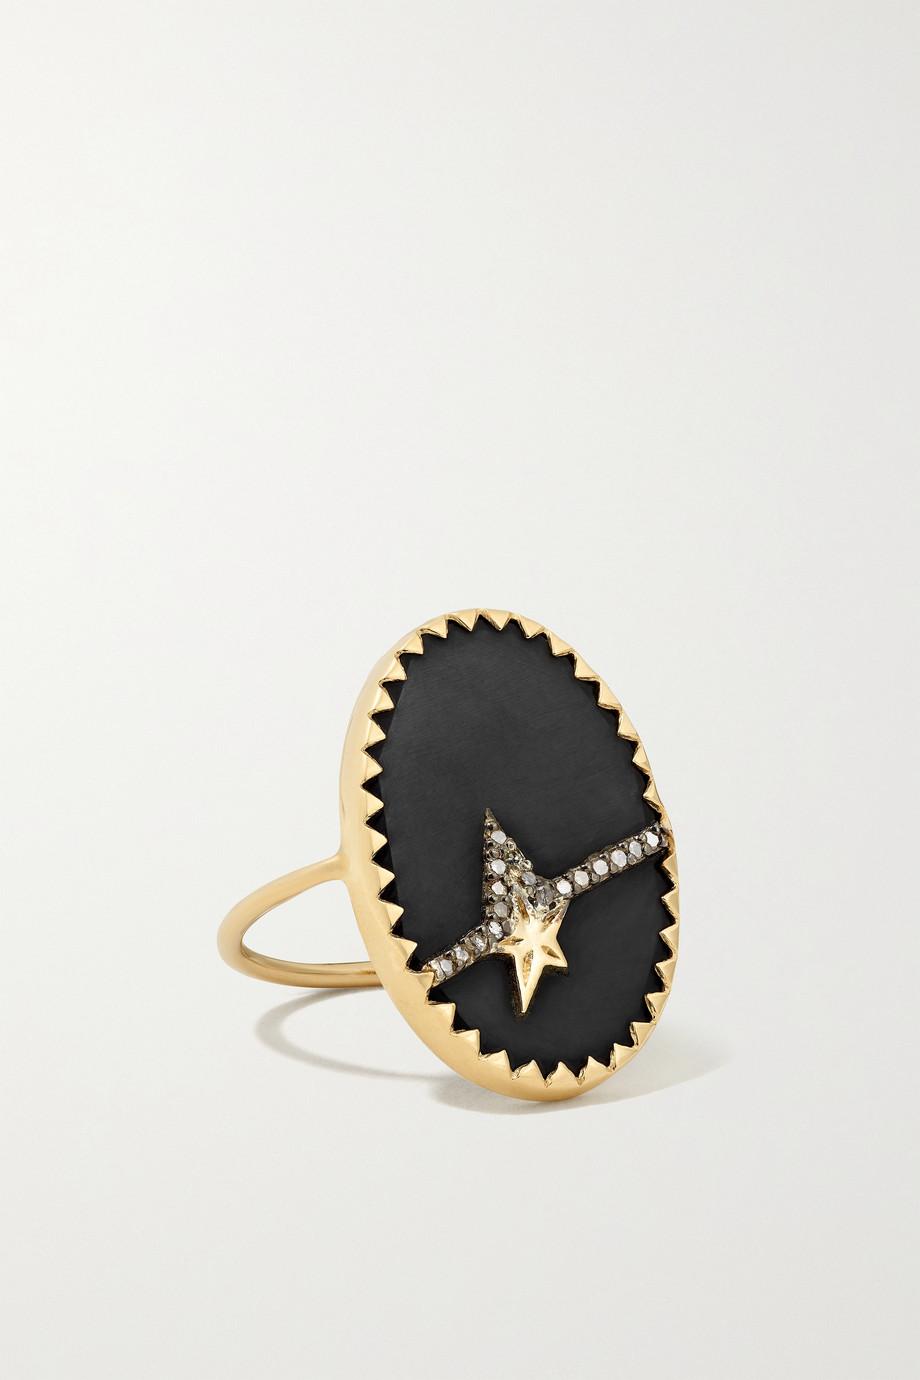 Pascale Monvoisin Varda N°3 Ring aus 9 Karat Gold und Sterlingsilber mit Bakelit® und Diamanten